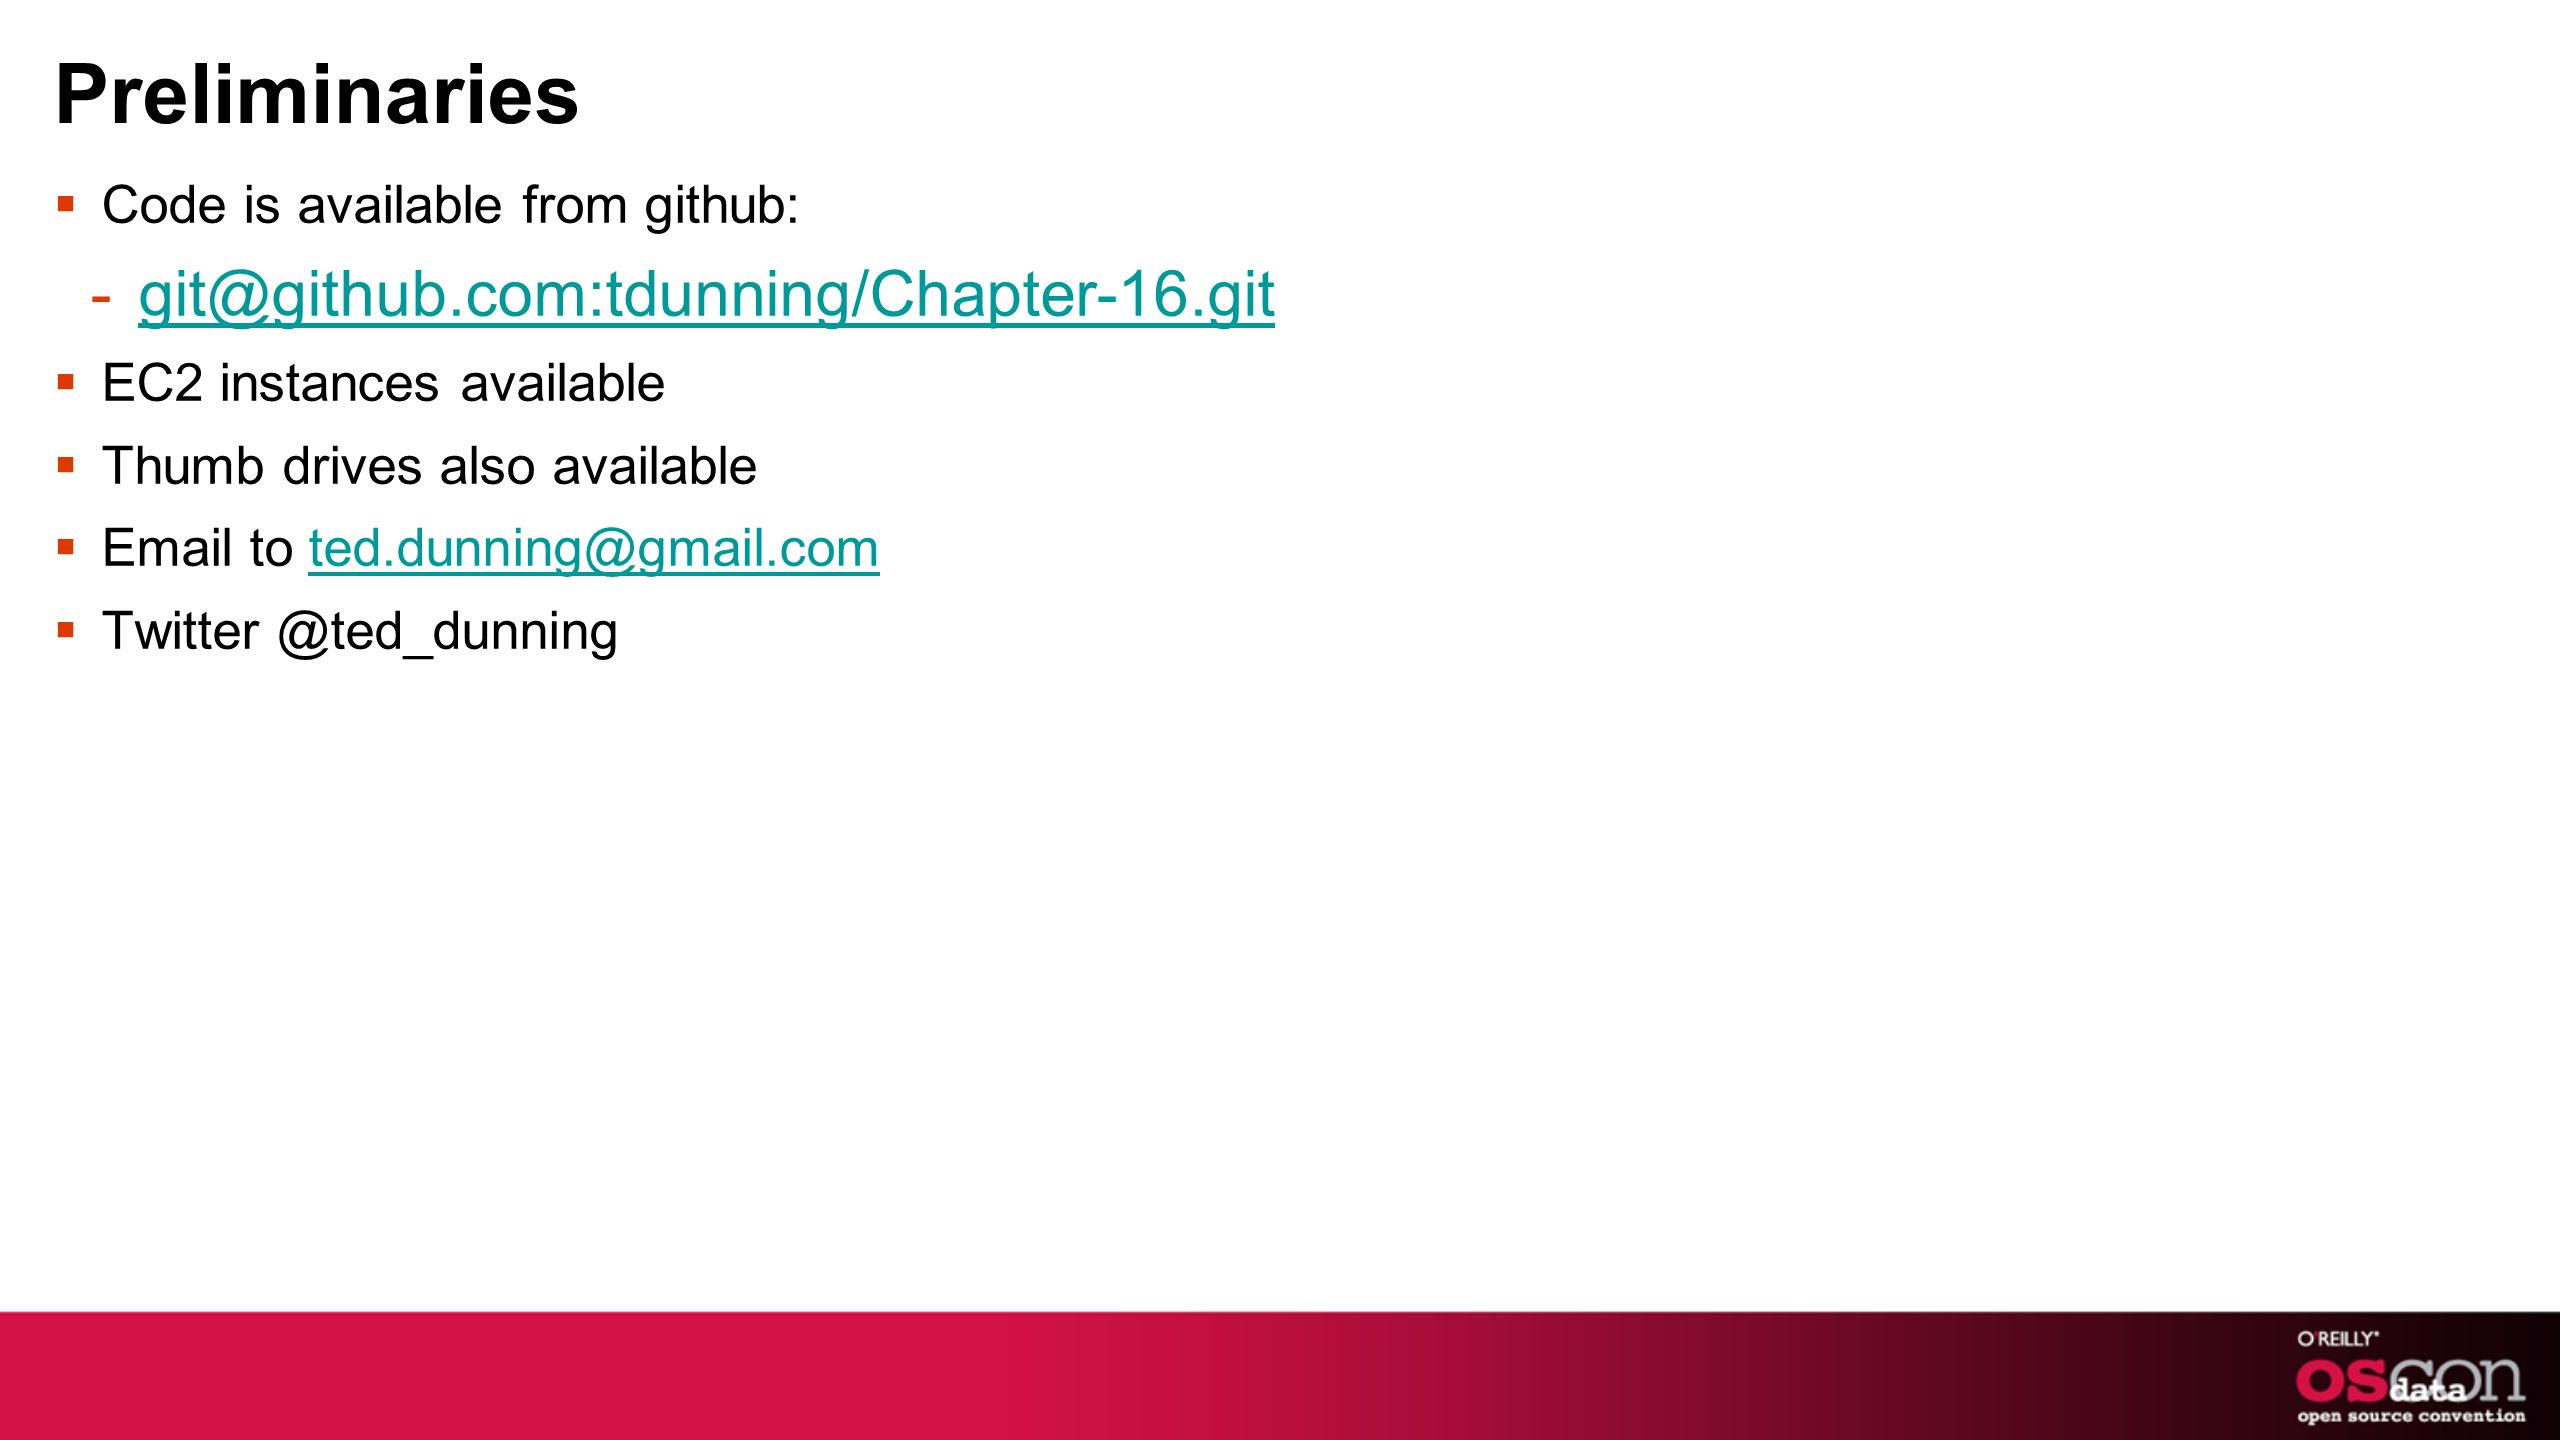 Preliminaries Code is available from github: -git@github.com:tdunning/Chapter-16.gitgit@github.com:tdunning/Chapter-16.git EC2 instances available Thu